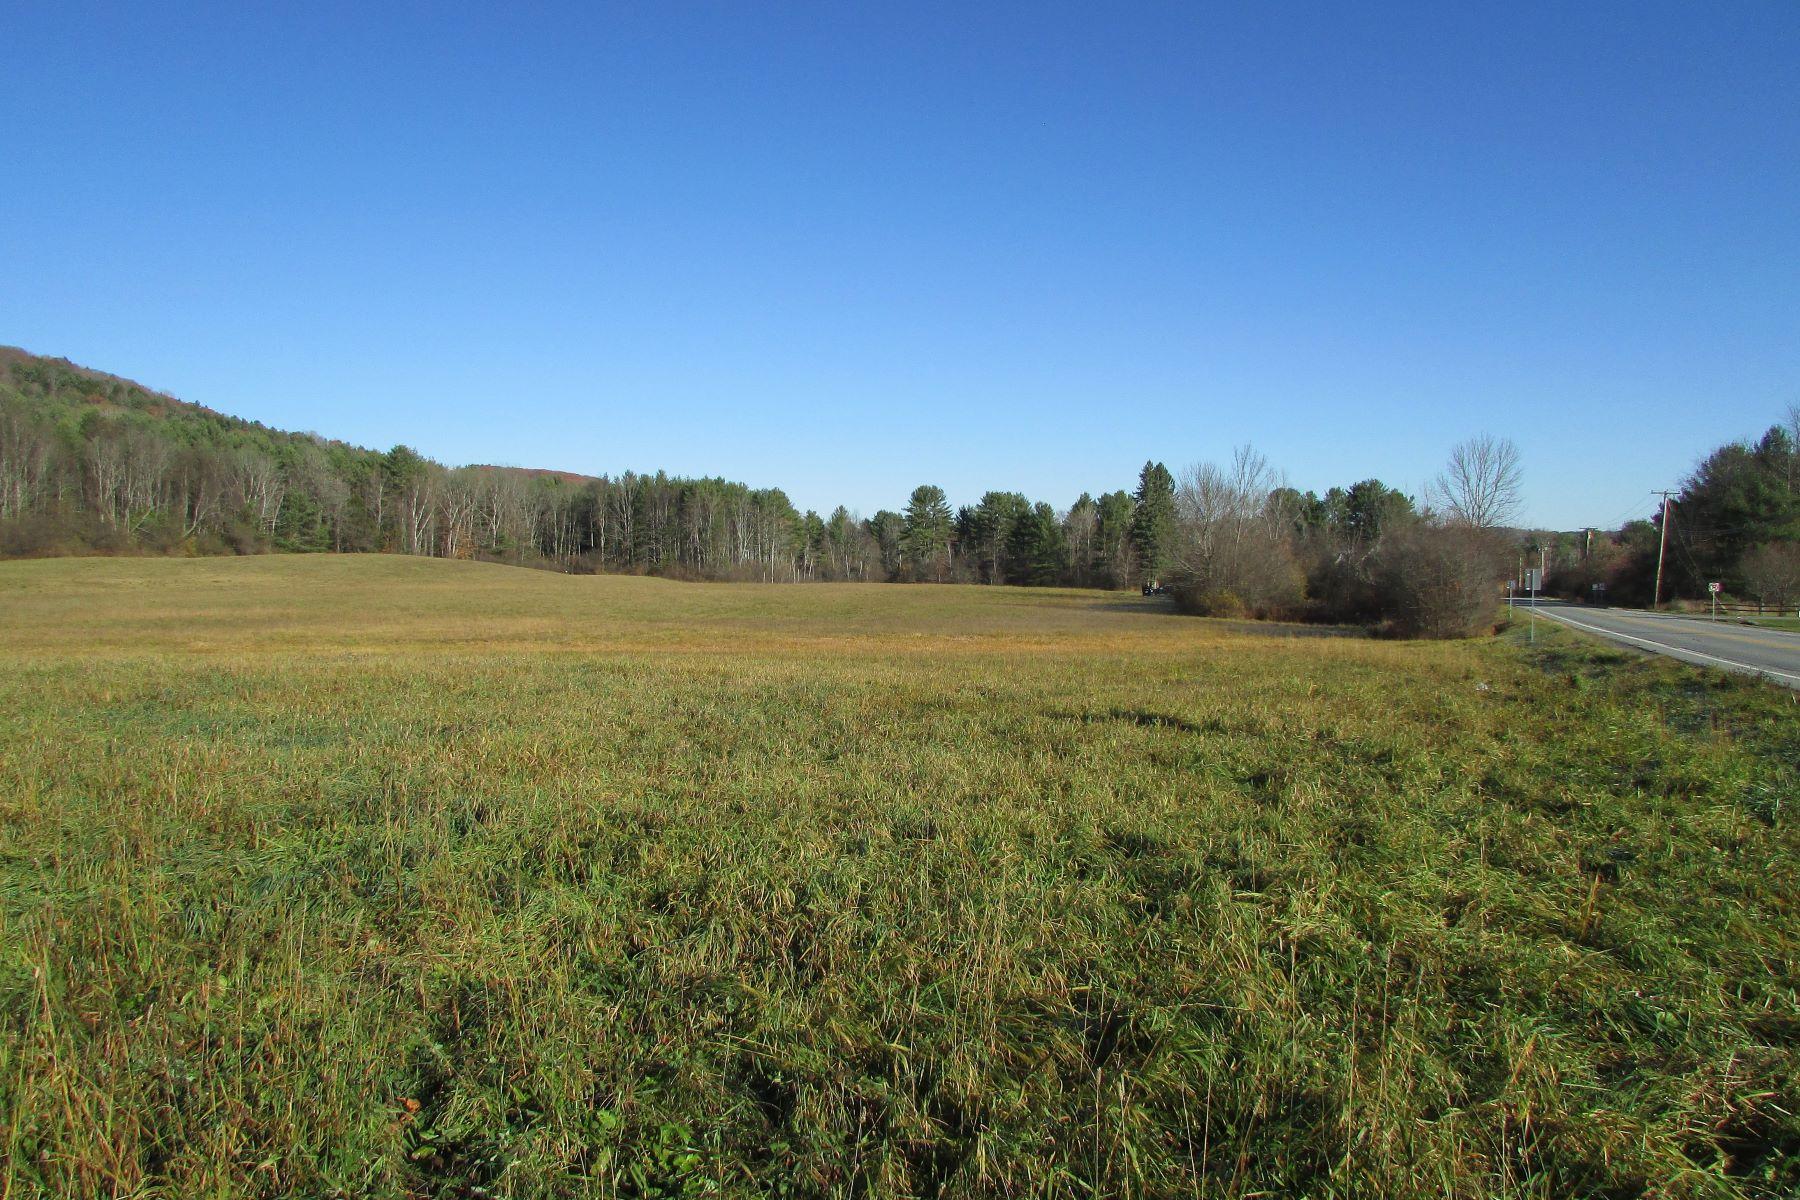 Земля для того Продажа на Highly Visible 34.7 Acres on Road in Norwich 00 Route 5 South, Norwich, Вермонт, 05055 Соединенные Штаты